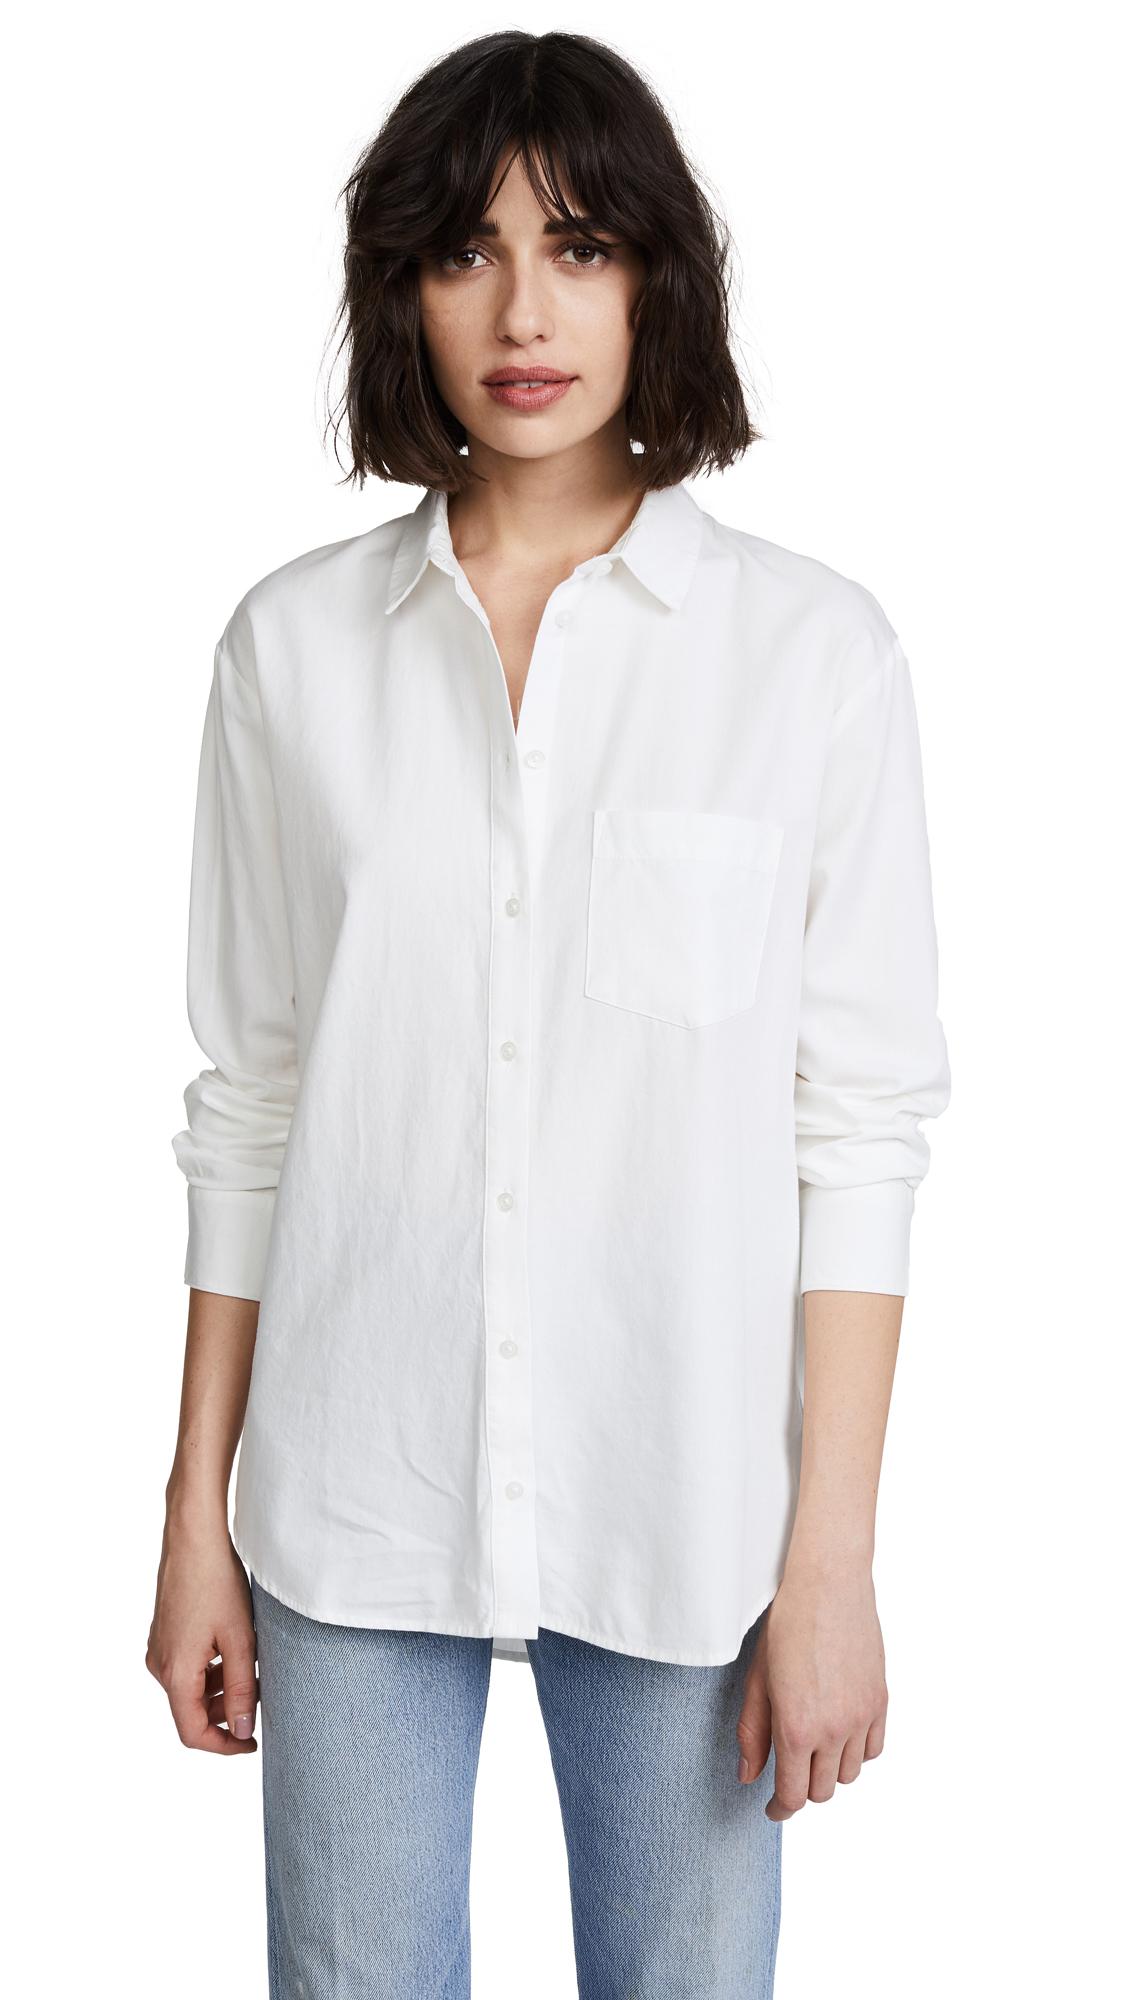 Madewell Drapey Oversized Boyshirt - Pure White